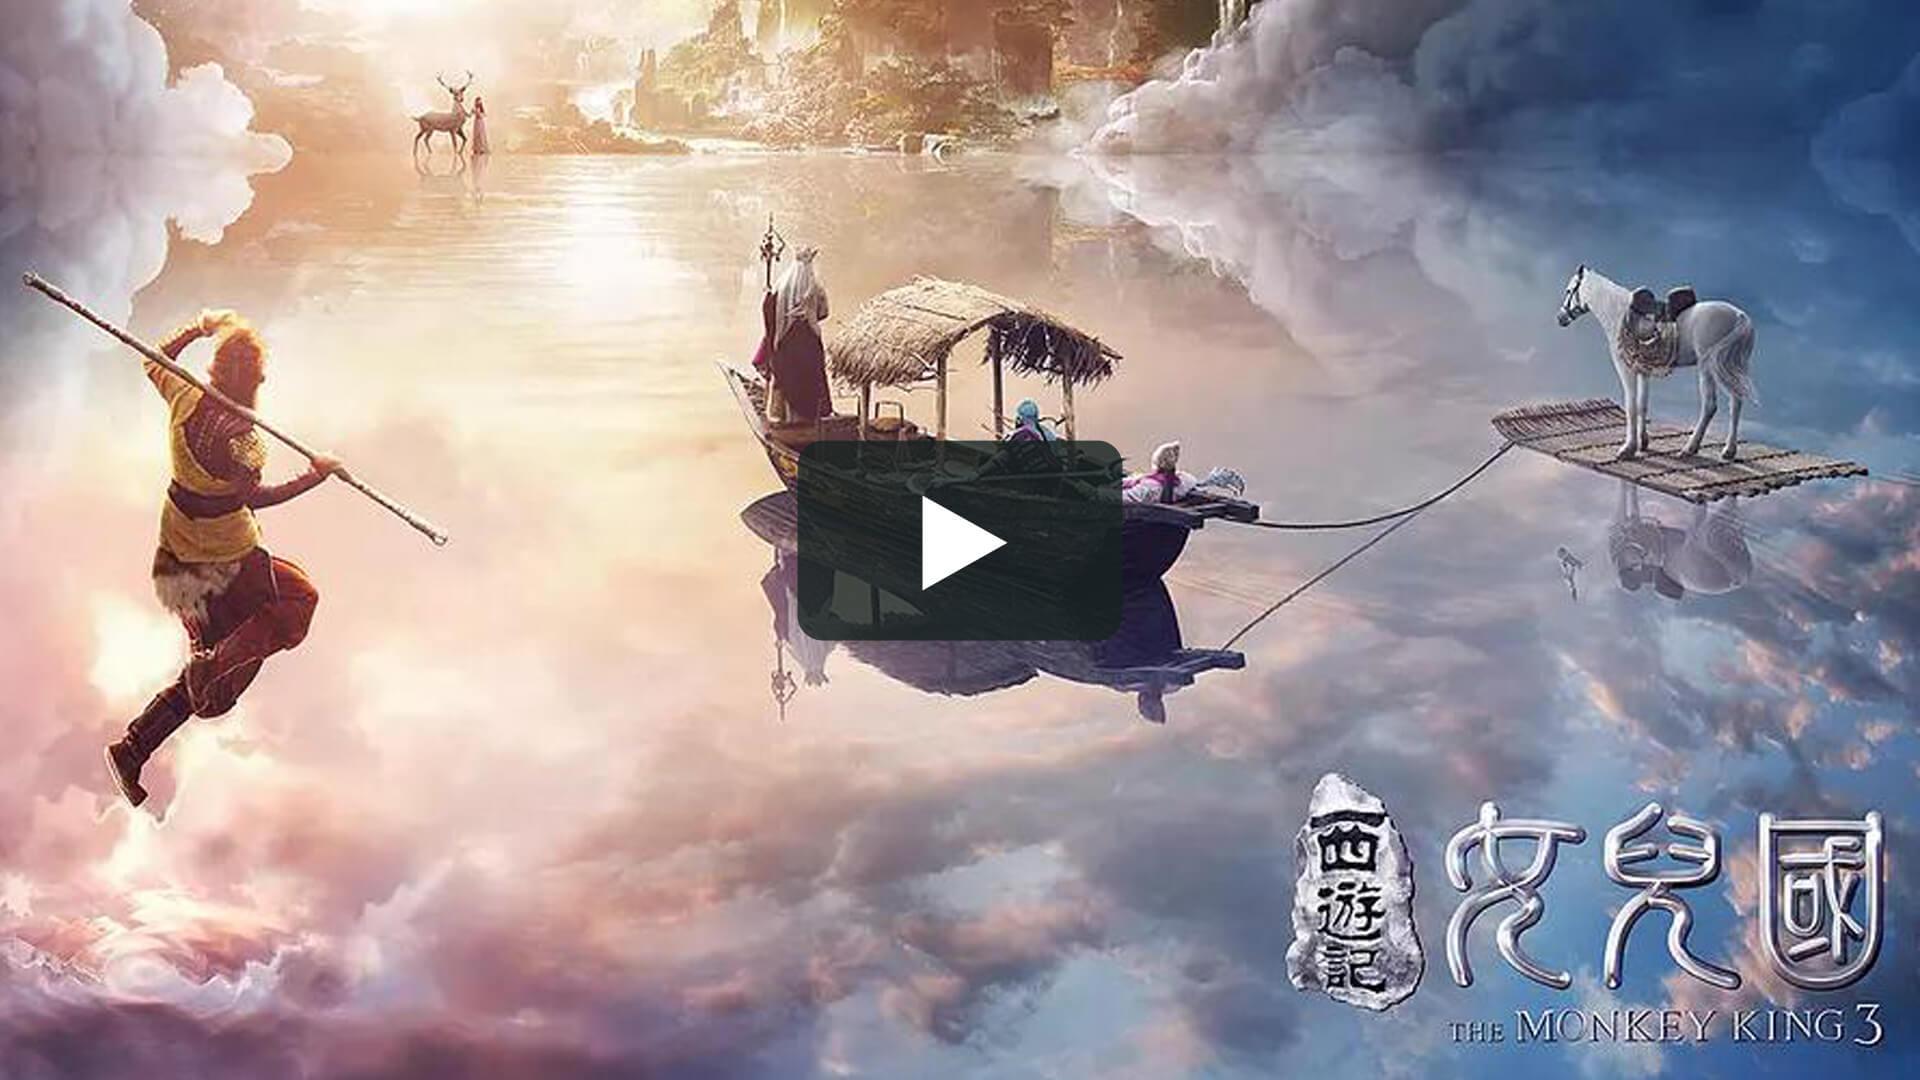 西遊記女兒國 - The Monkey King 3: Kingdom of Women